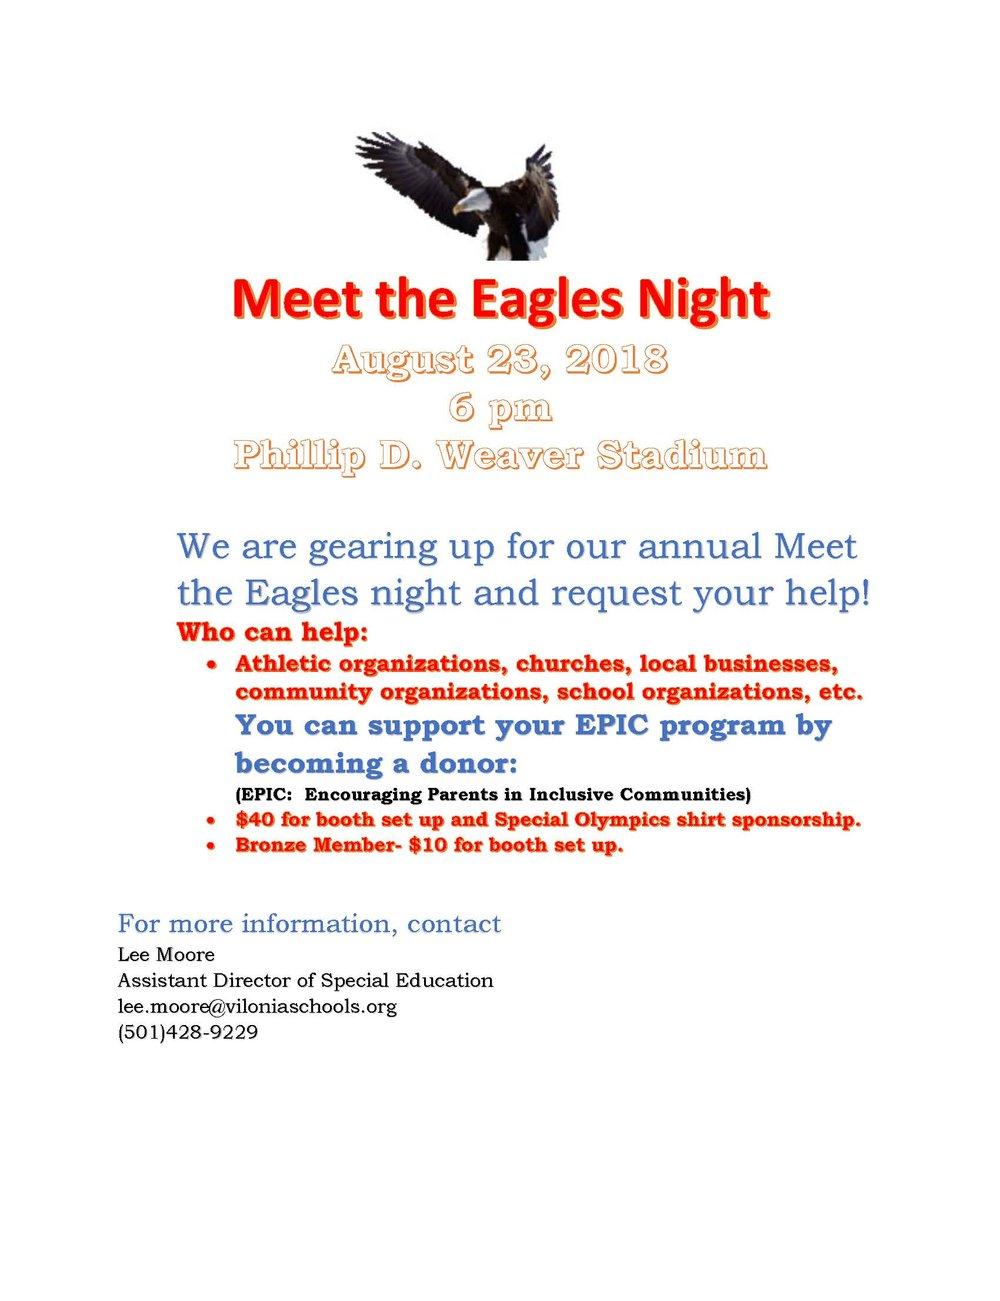 Meet the Eagles Night Final.jpg